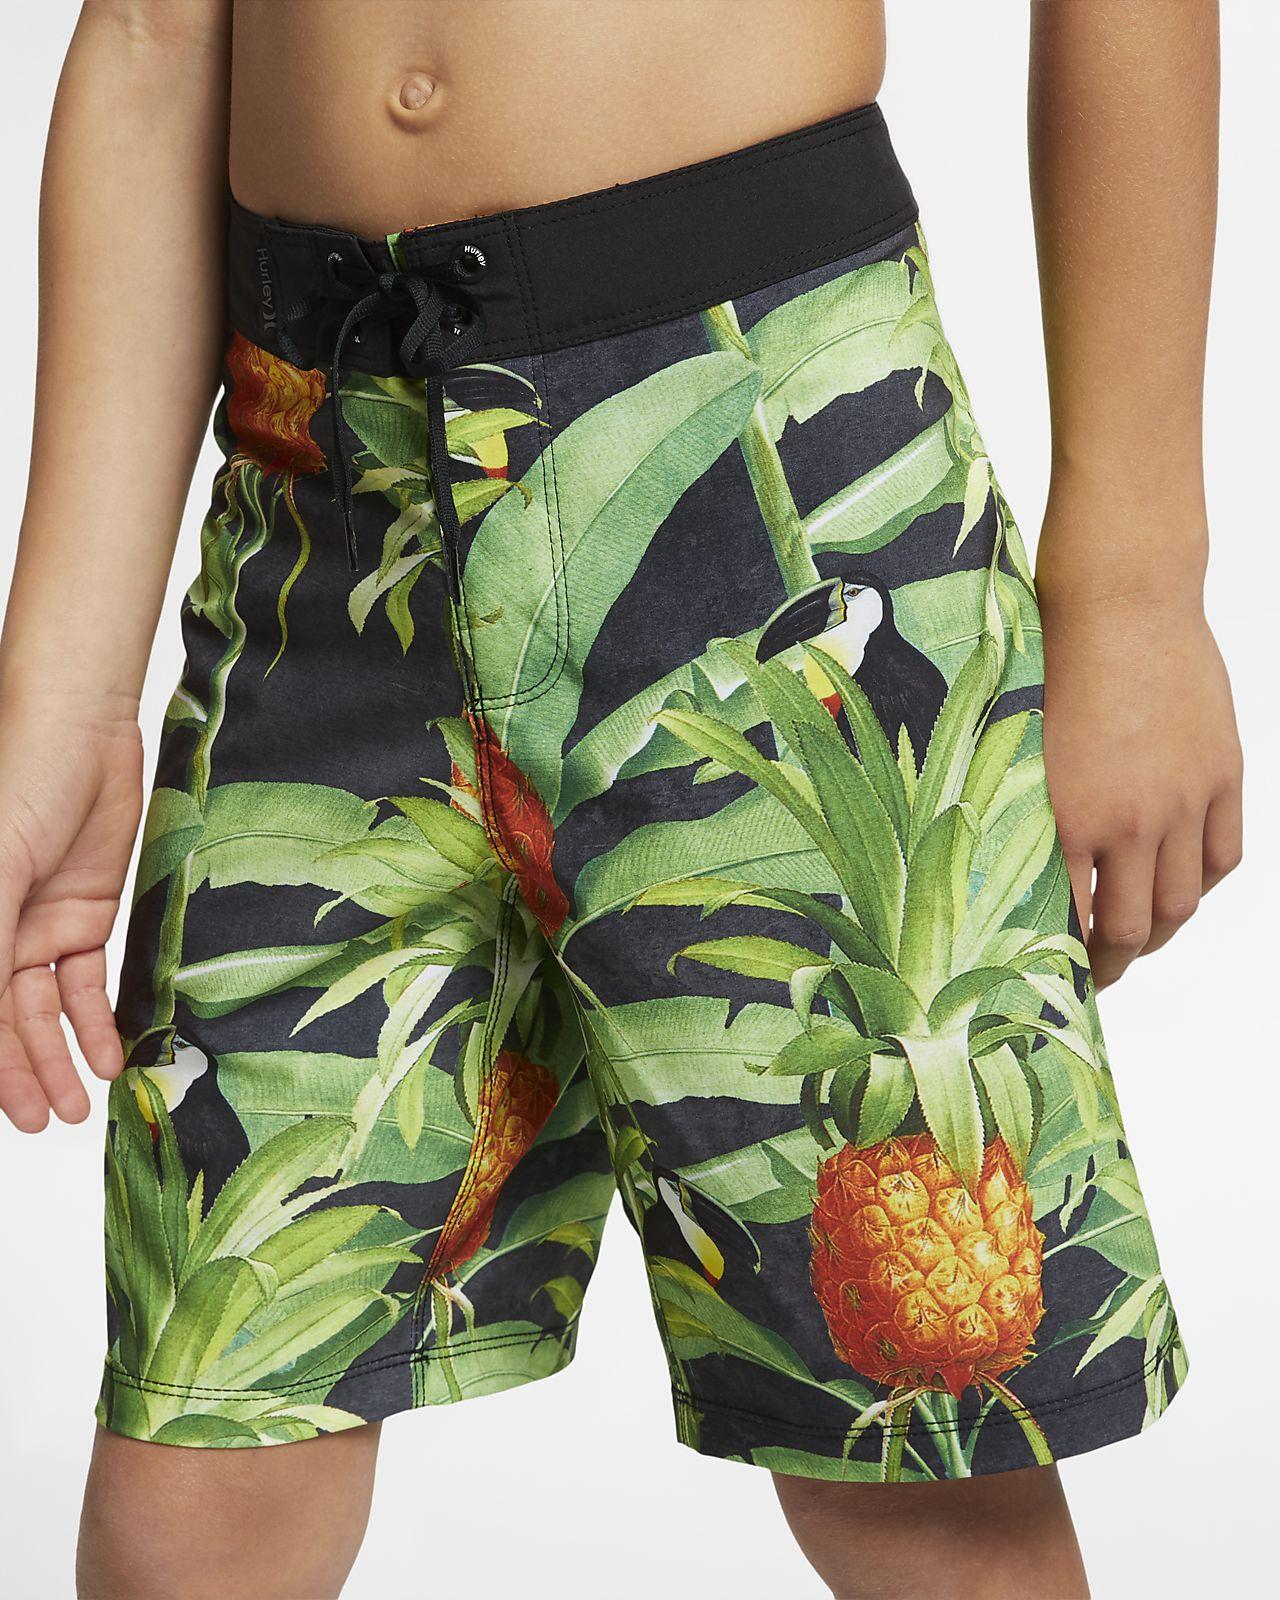 Hurley Phantom Costa Rica shorts (41 cm) til gutt